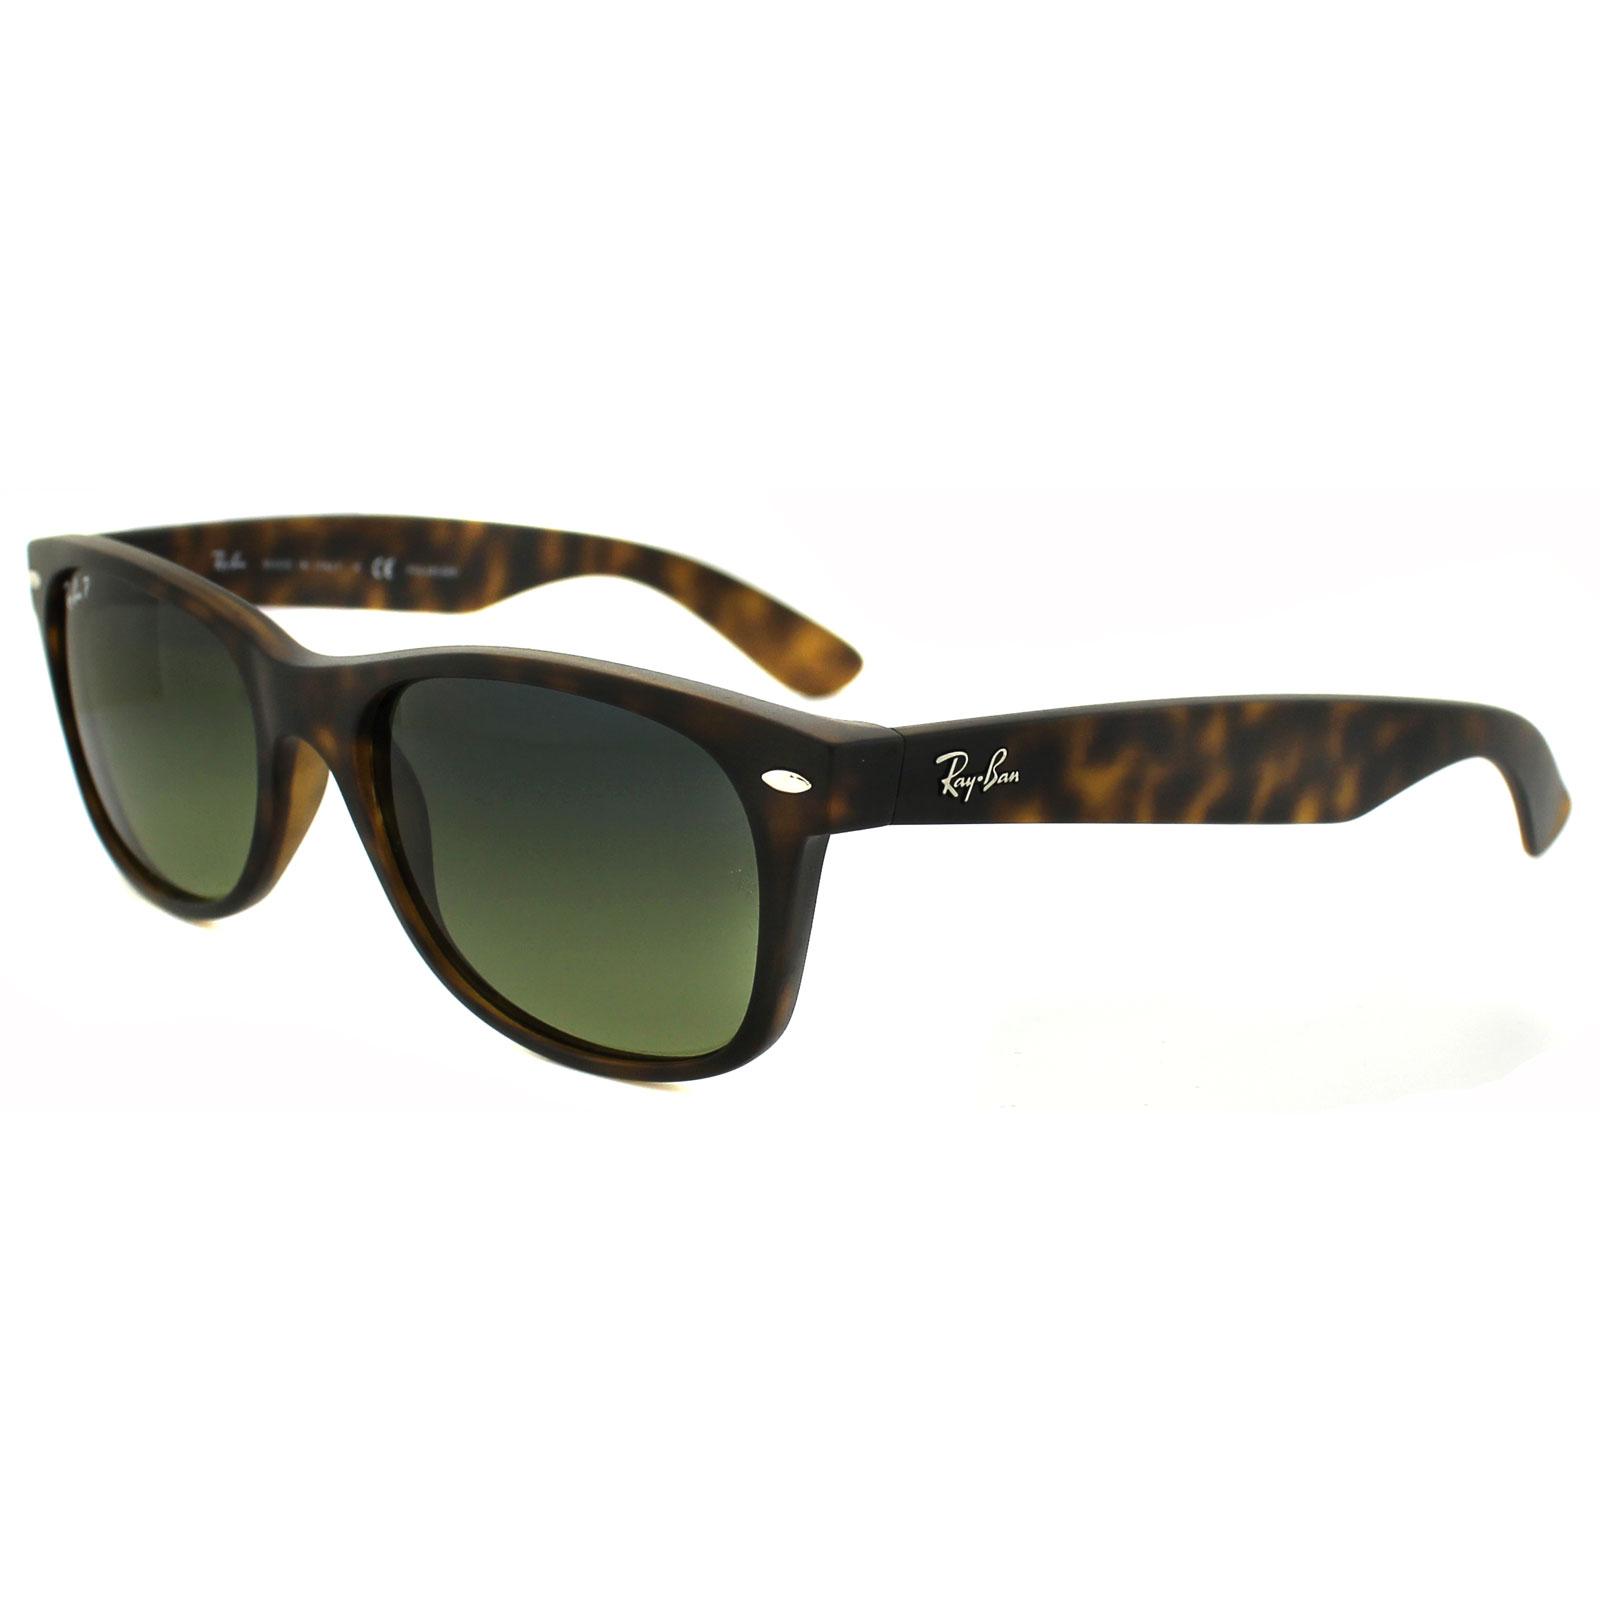 5eea18ab9f RayBan Sunglasses New Wayfarer 2132 894 76 Havana Blue Green Mirror  Polarized